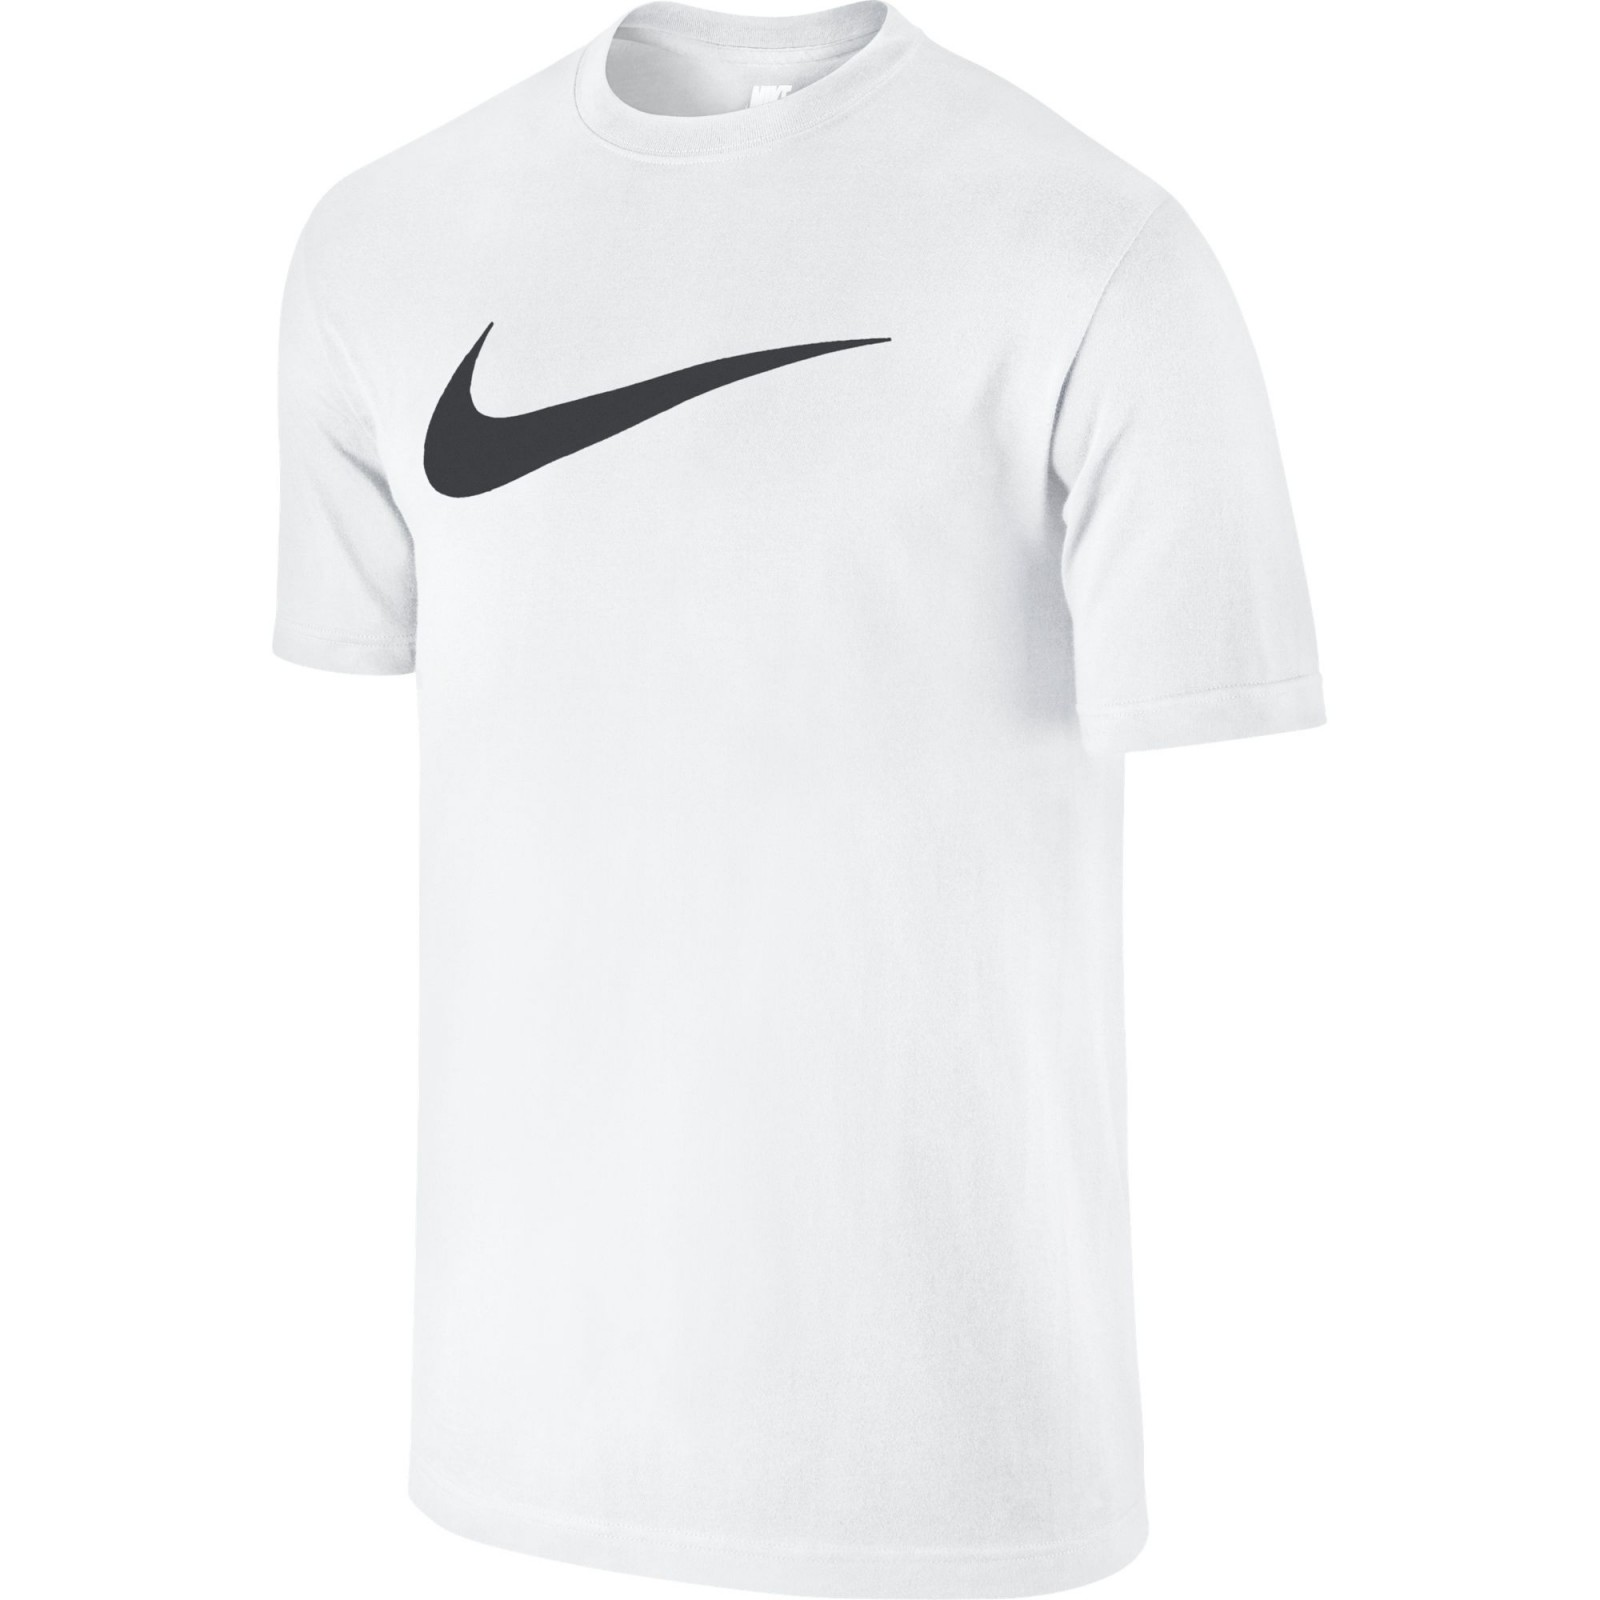 9c07cf9e0fd4 Pánské tričko Nike TEE-CHEST SWOOSH